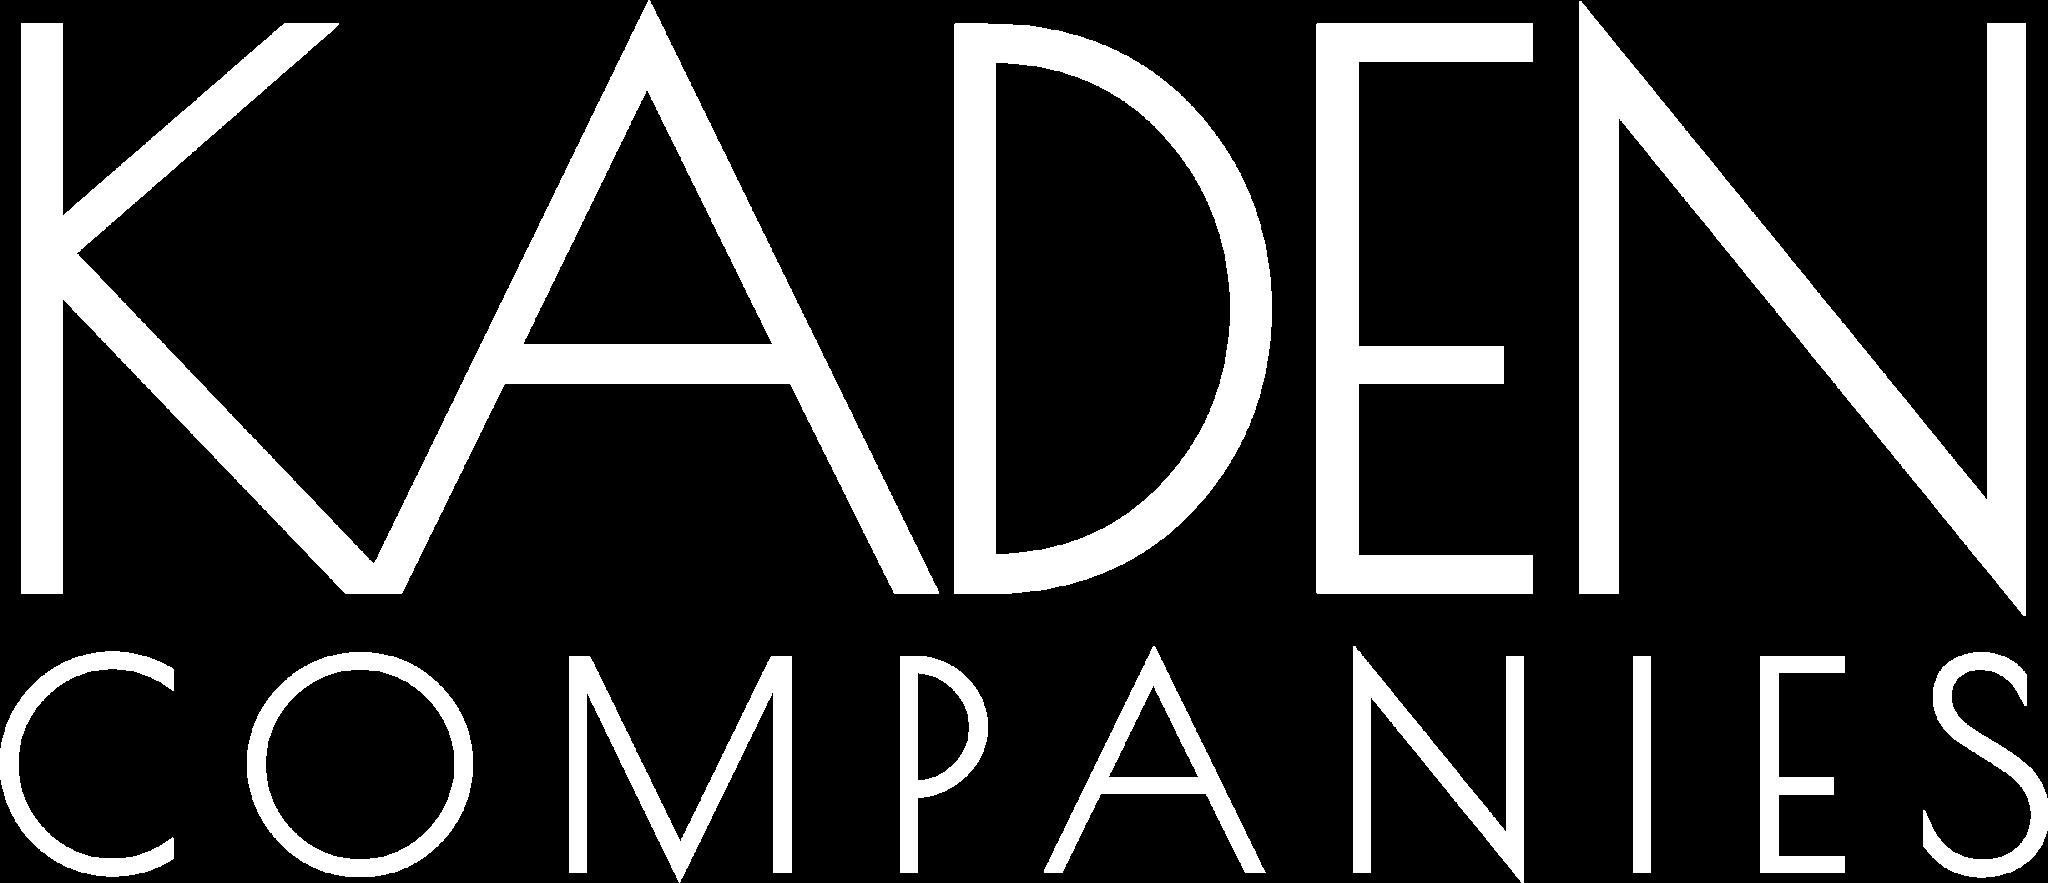 Kaden Companies